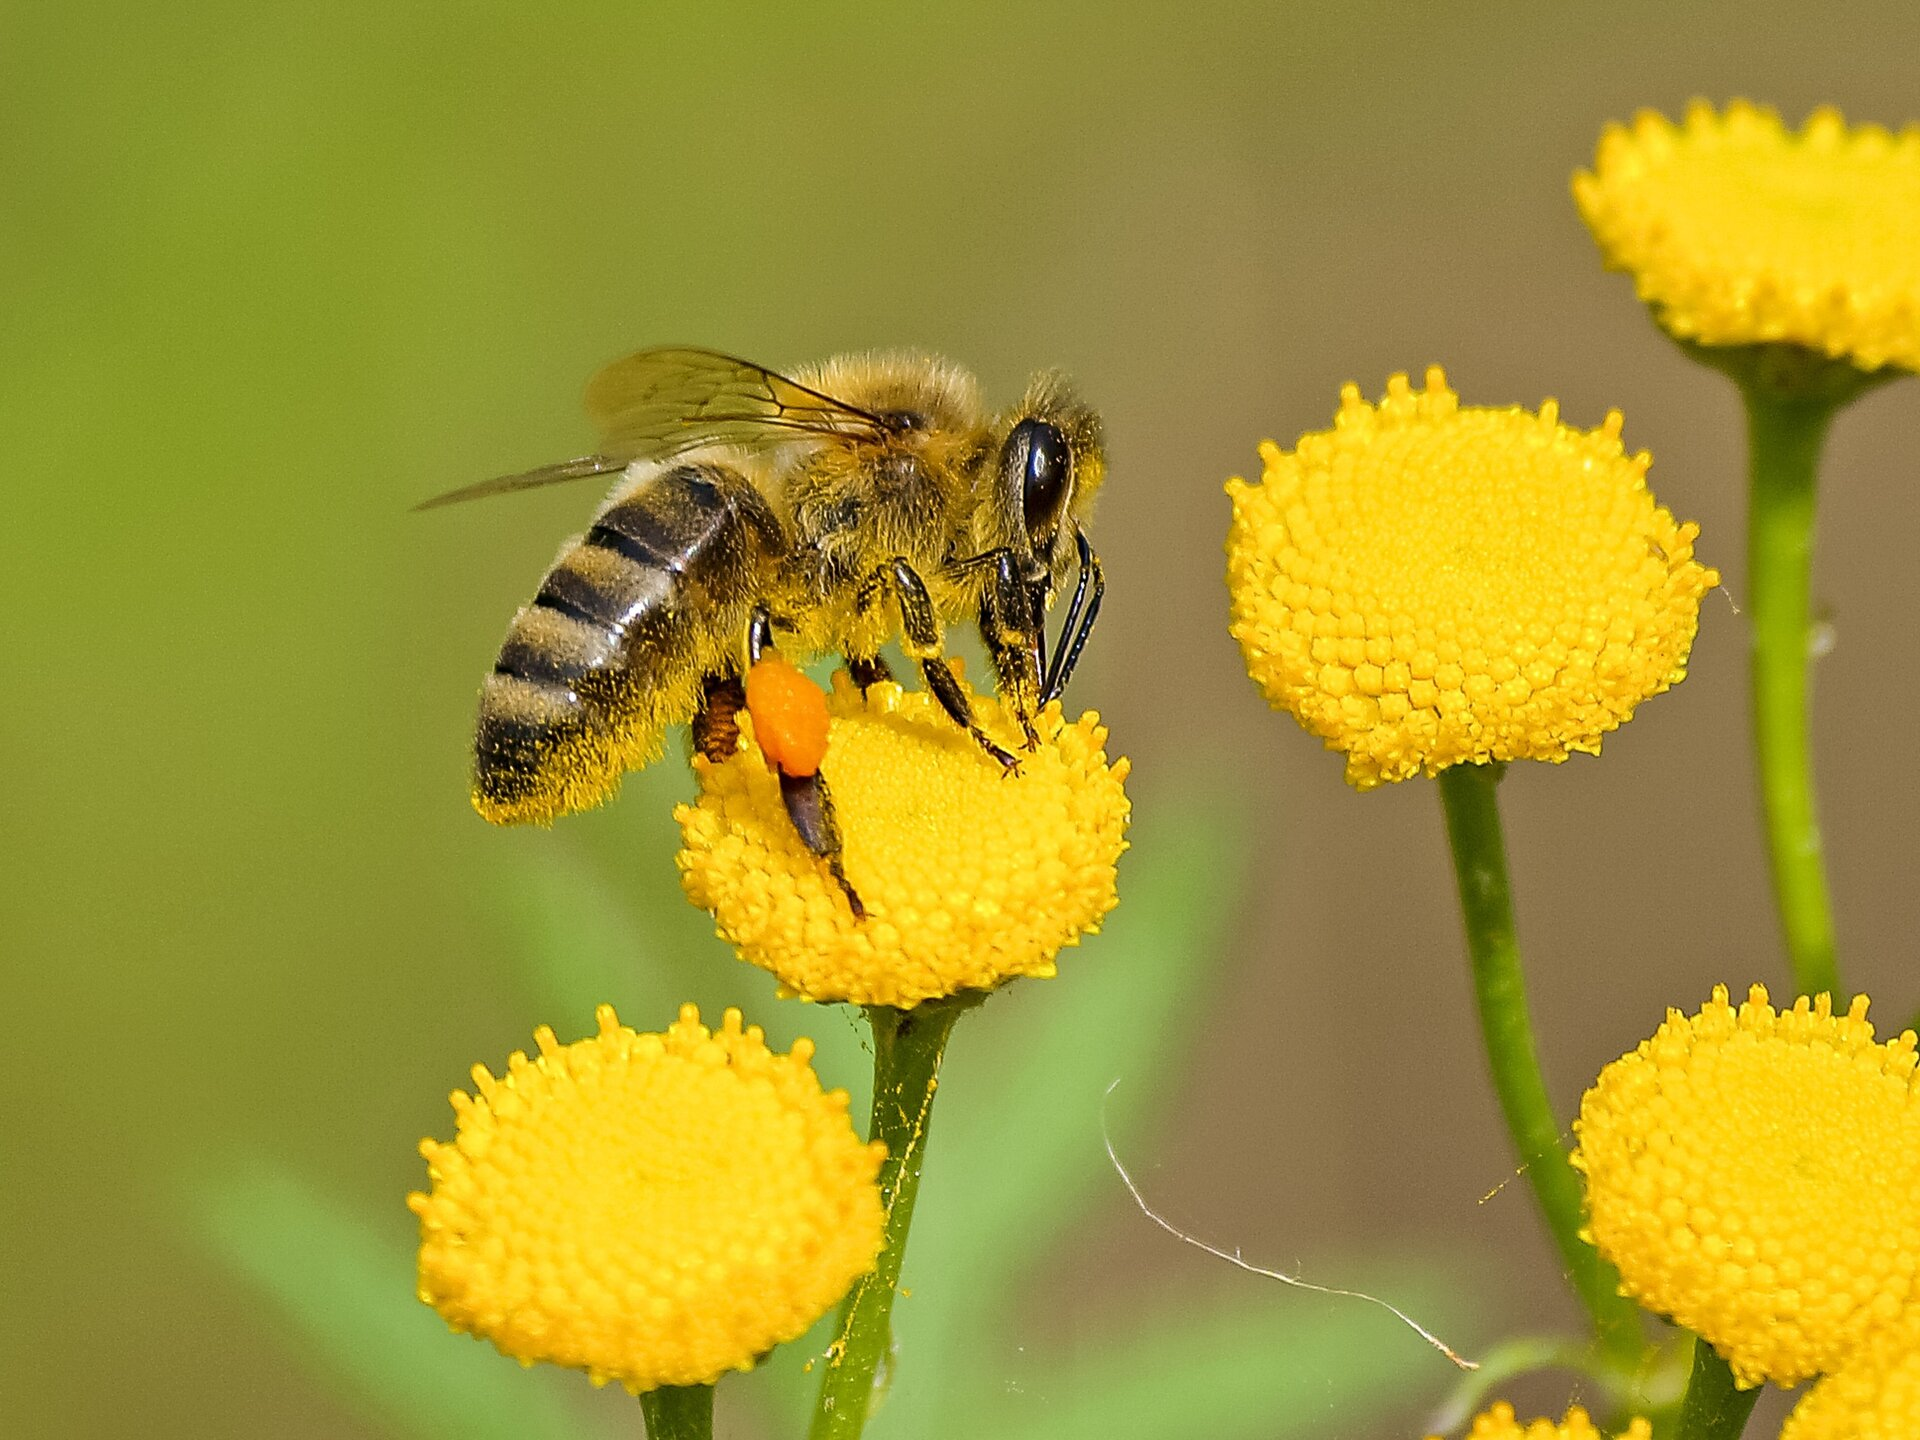 Honigbiene auf Rainfarn